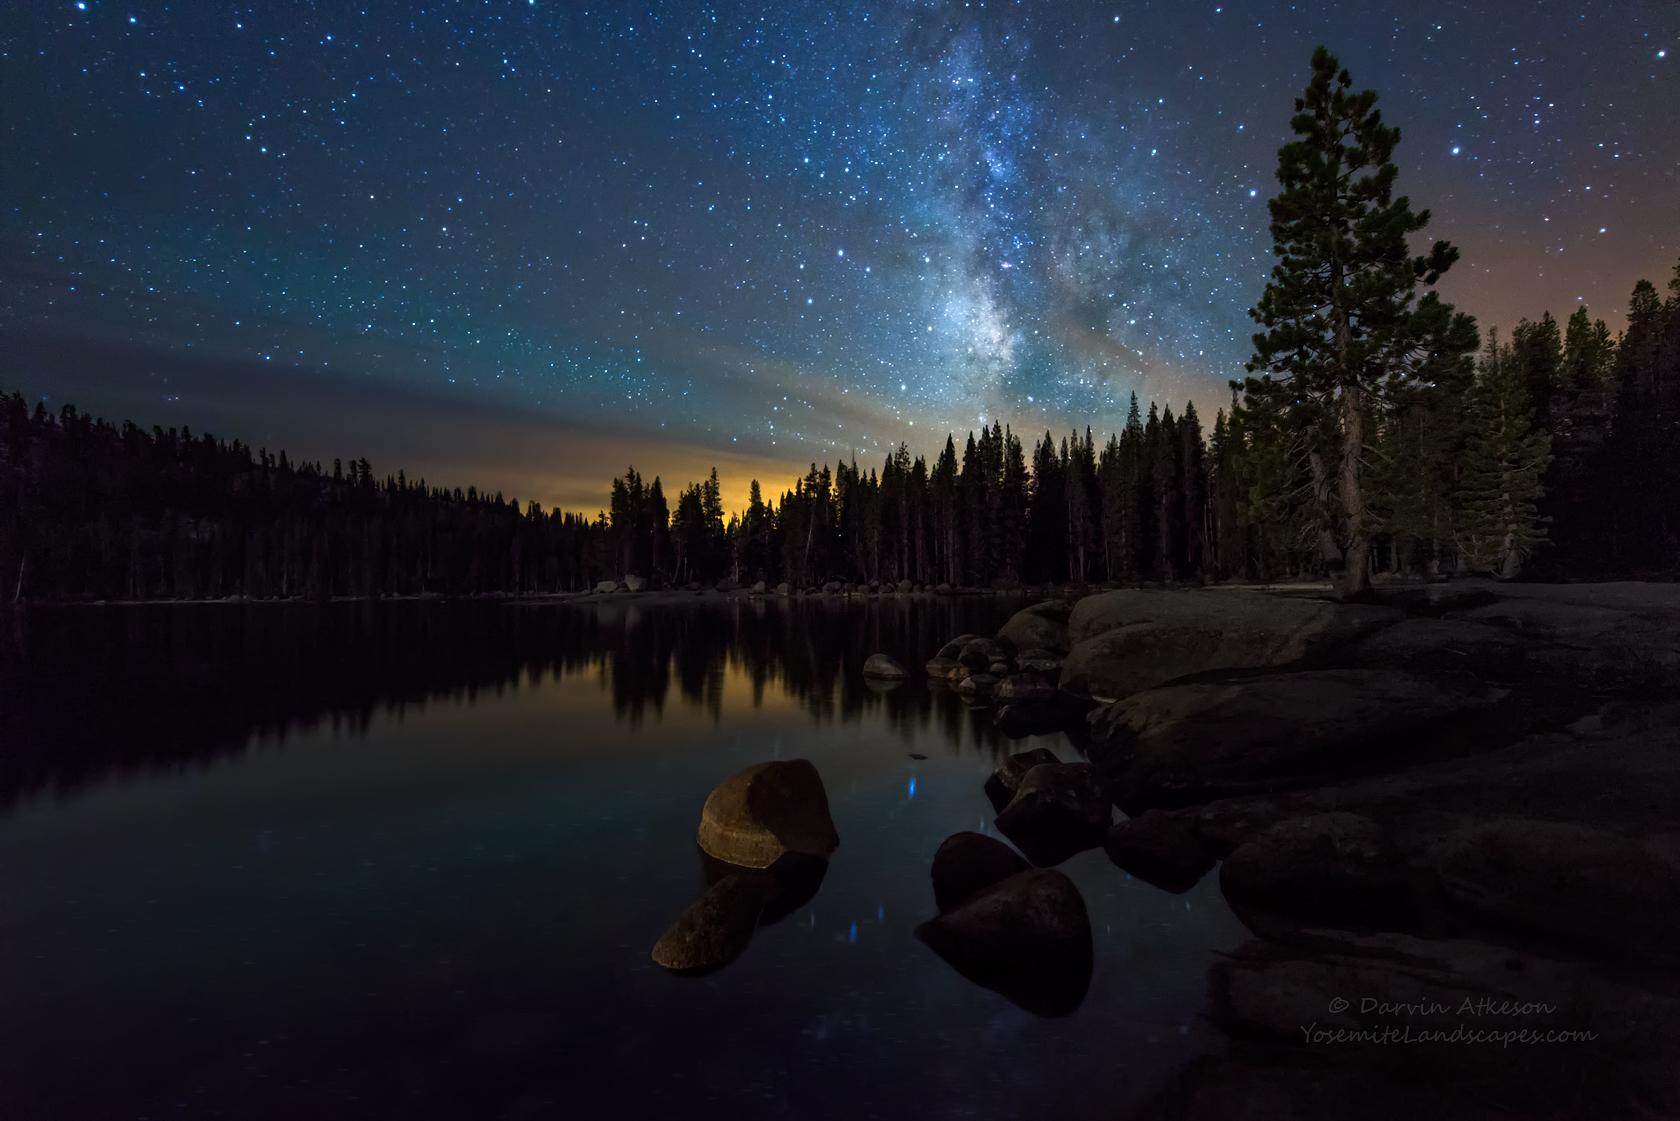 Milky Way Over Yosemite's Tuolumne Meadows